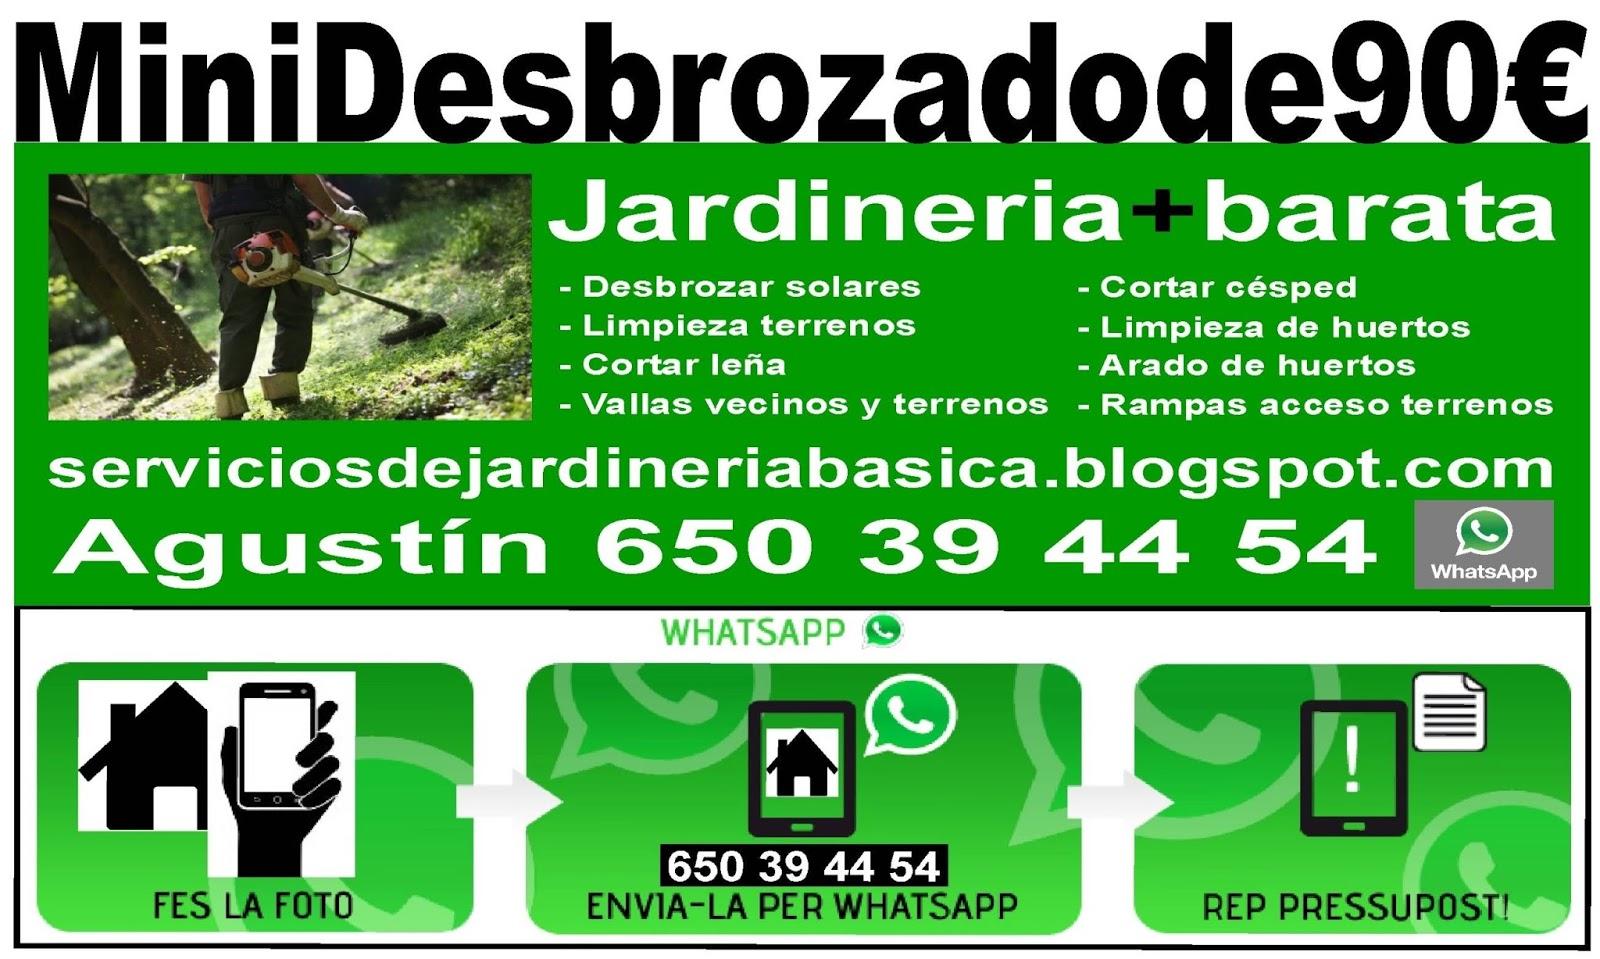 Serviciosdejardineriabasica minidsebrozadode90 for Jardineria barata barcelona